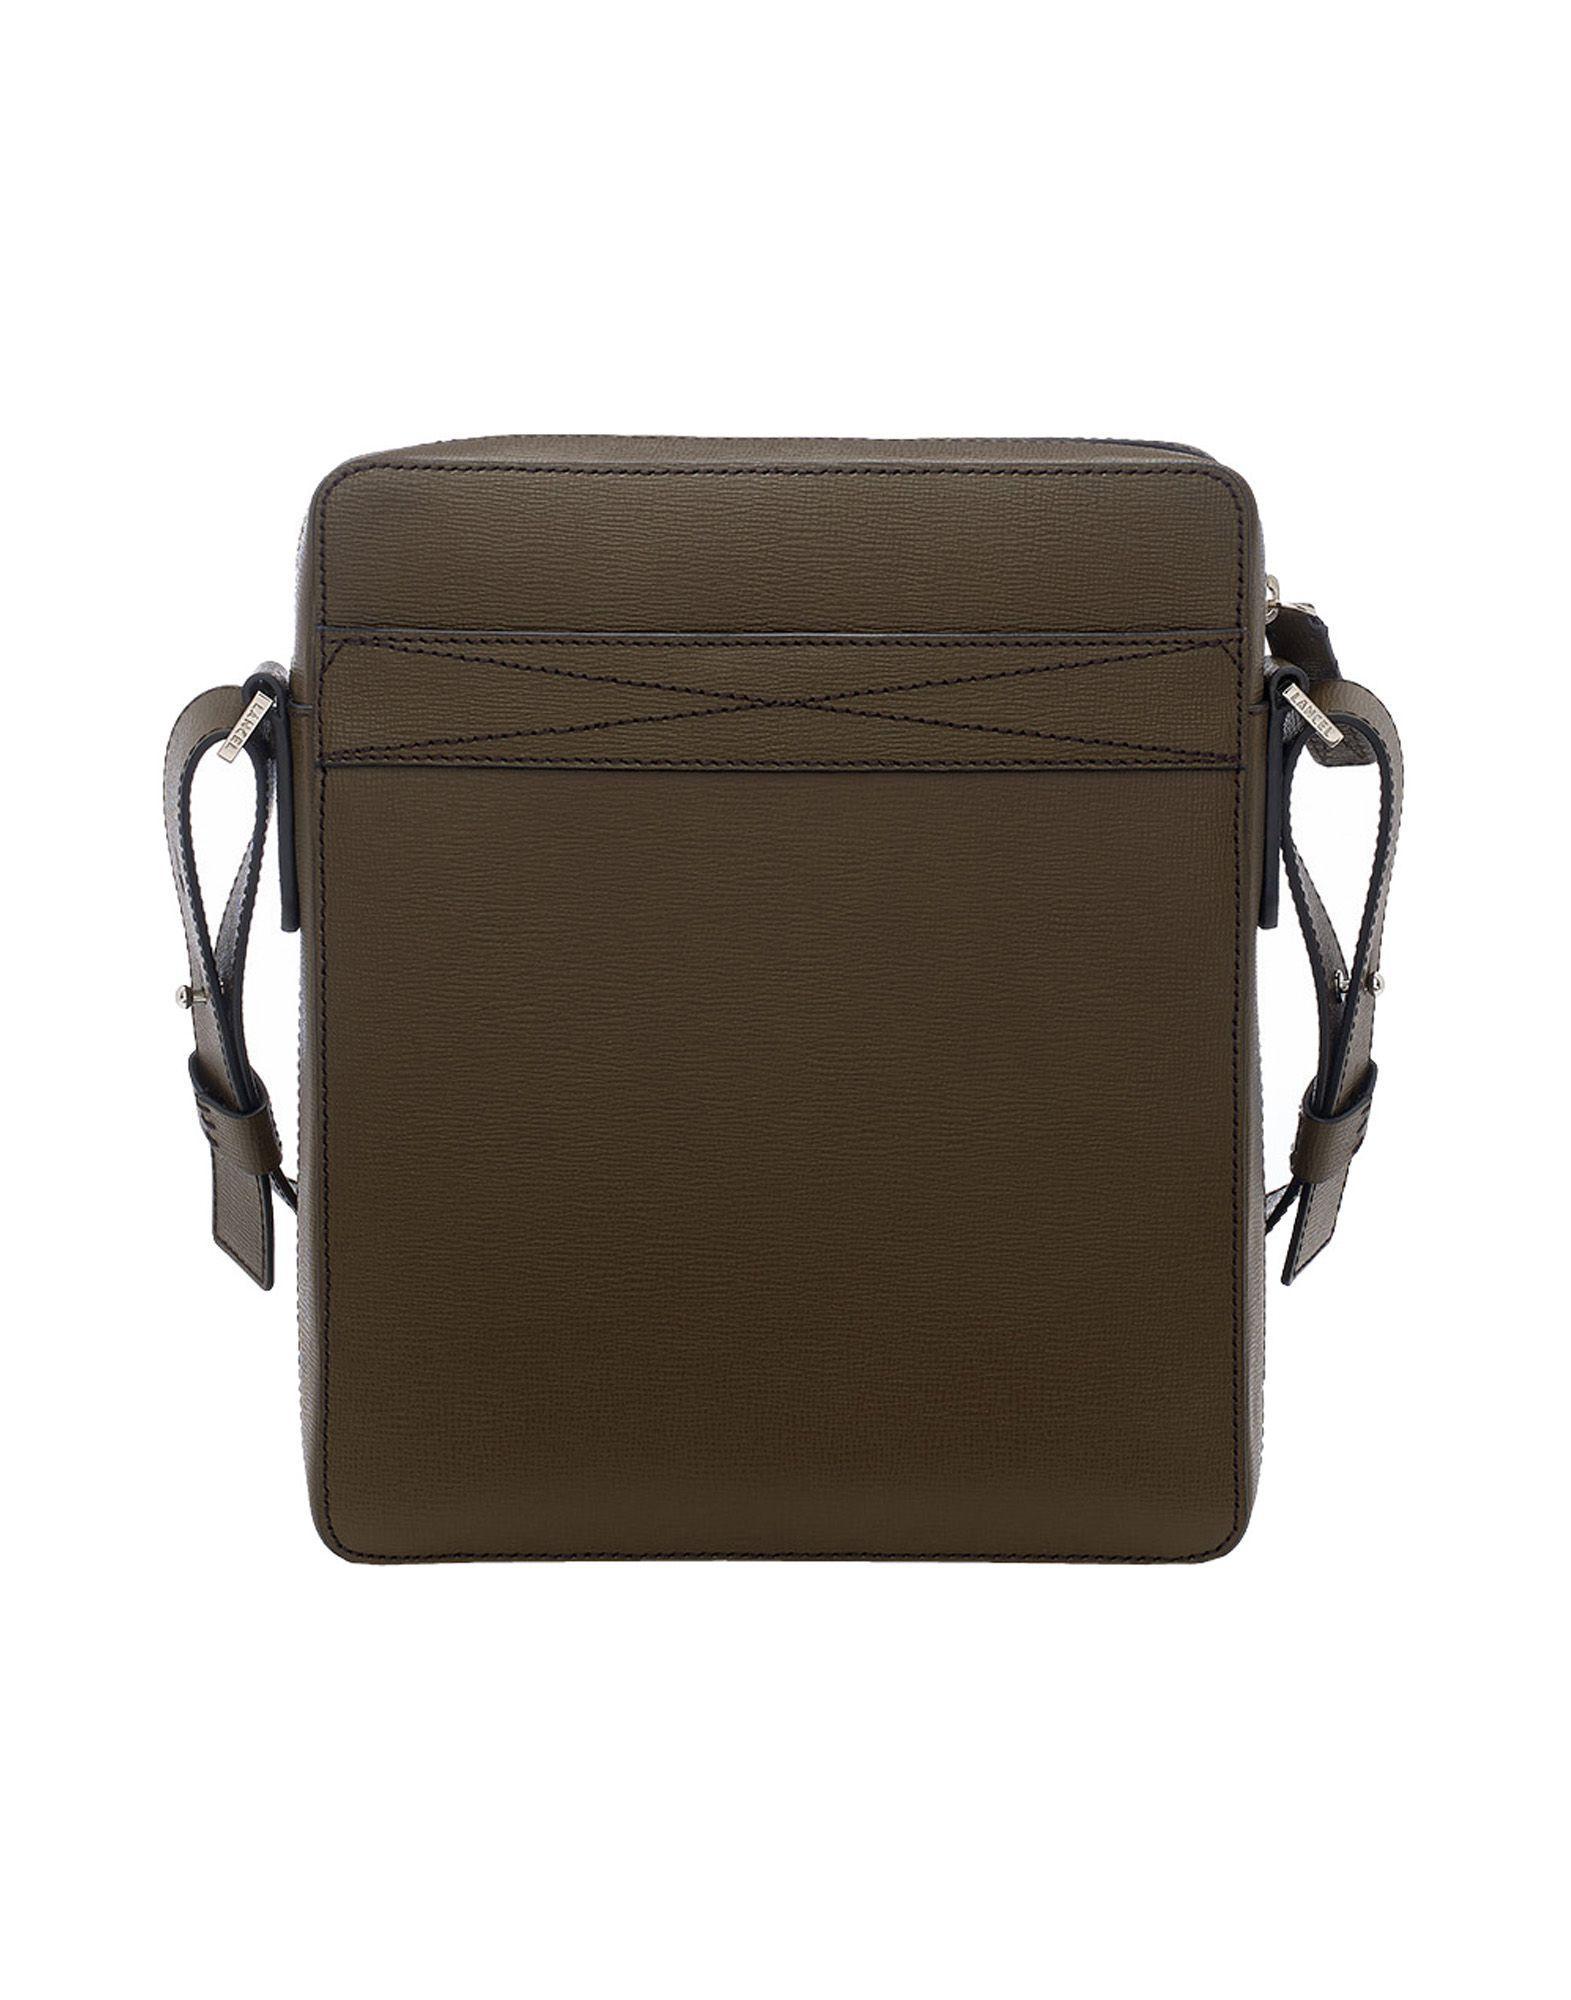 Lancel Leather Cross-body Bags in Dark Brown (Brown) for Men